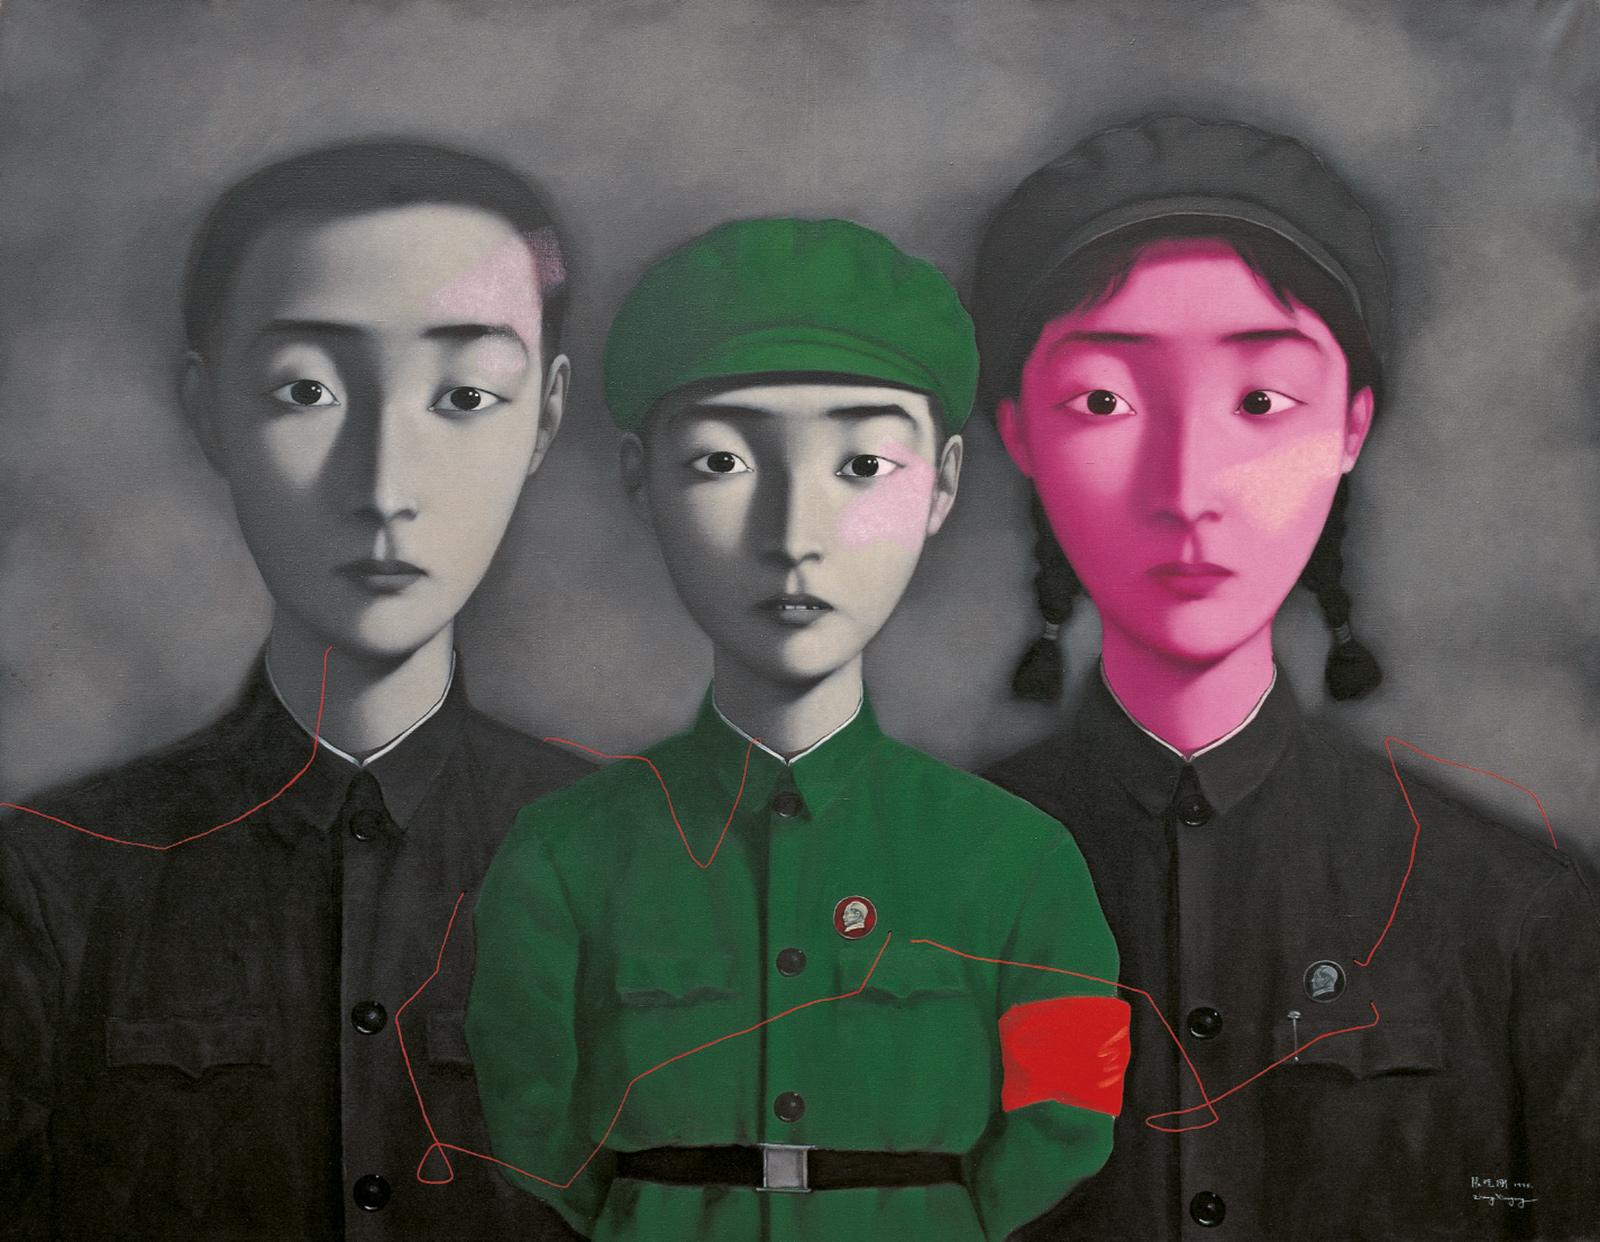 Zhang Xiaogang: Bloodline—Big Family No. 3, 1995; from the book Zhang Xiaogang: Disquieting Memories, by Jonathan Fineberg and Gary G. Xu, published by Phaidon